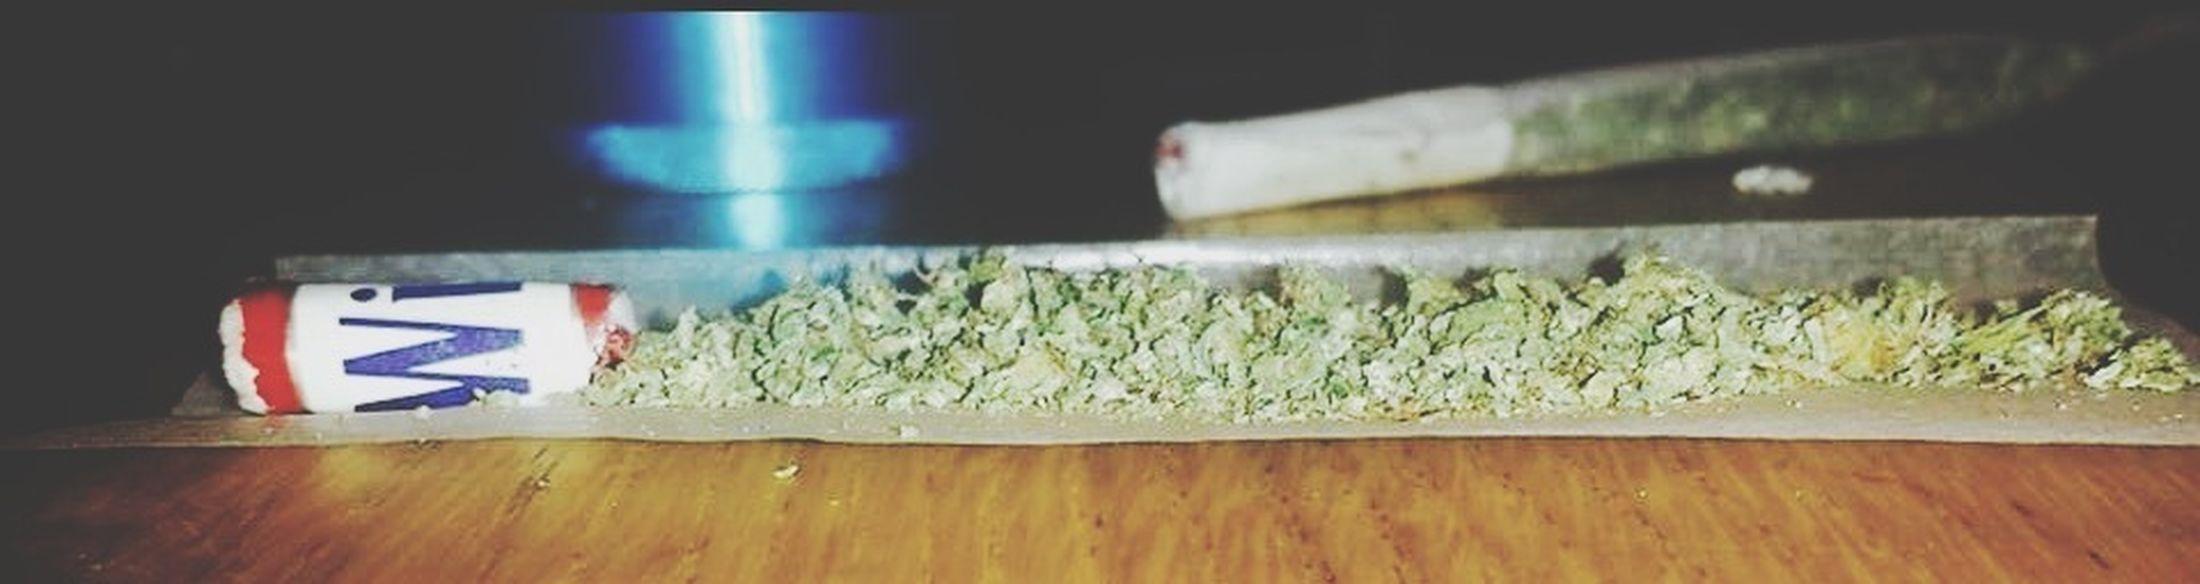 Good Nigth 420 Somke Weed Happy